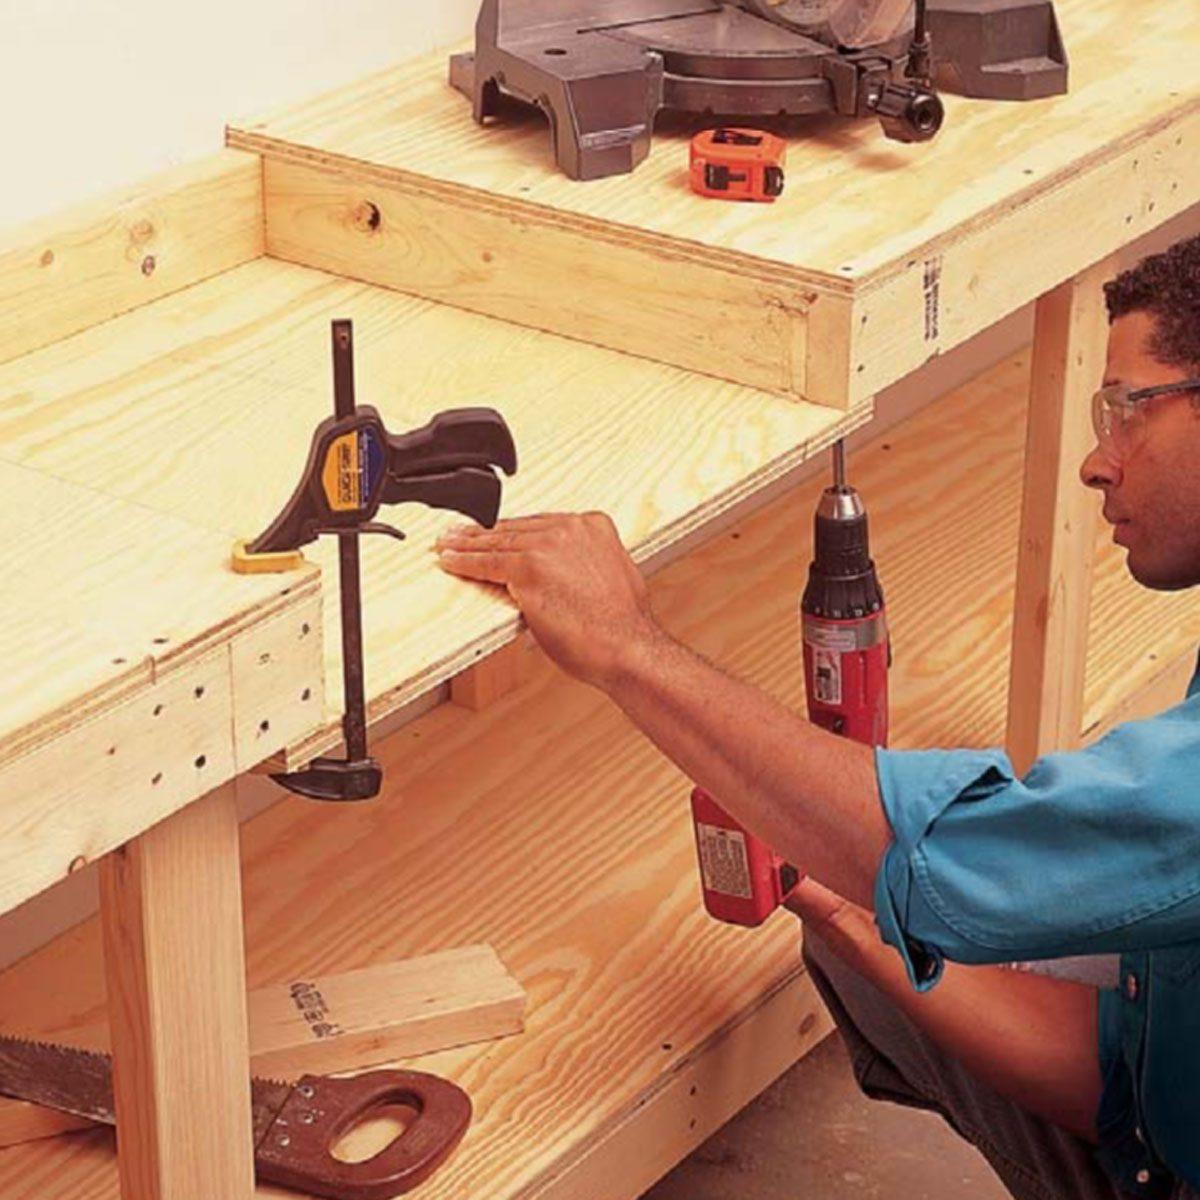 Modular Workbench Plans How To Build A Modular Workbench